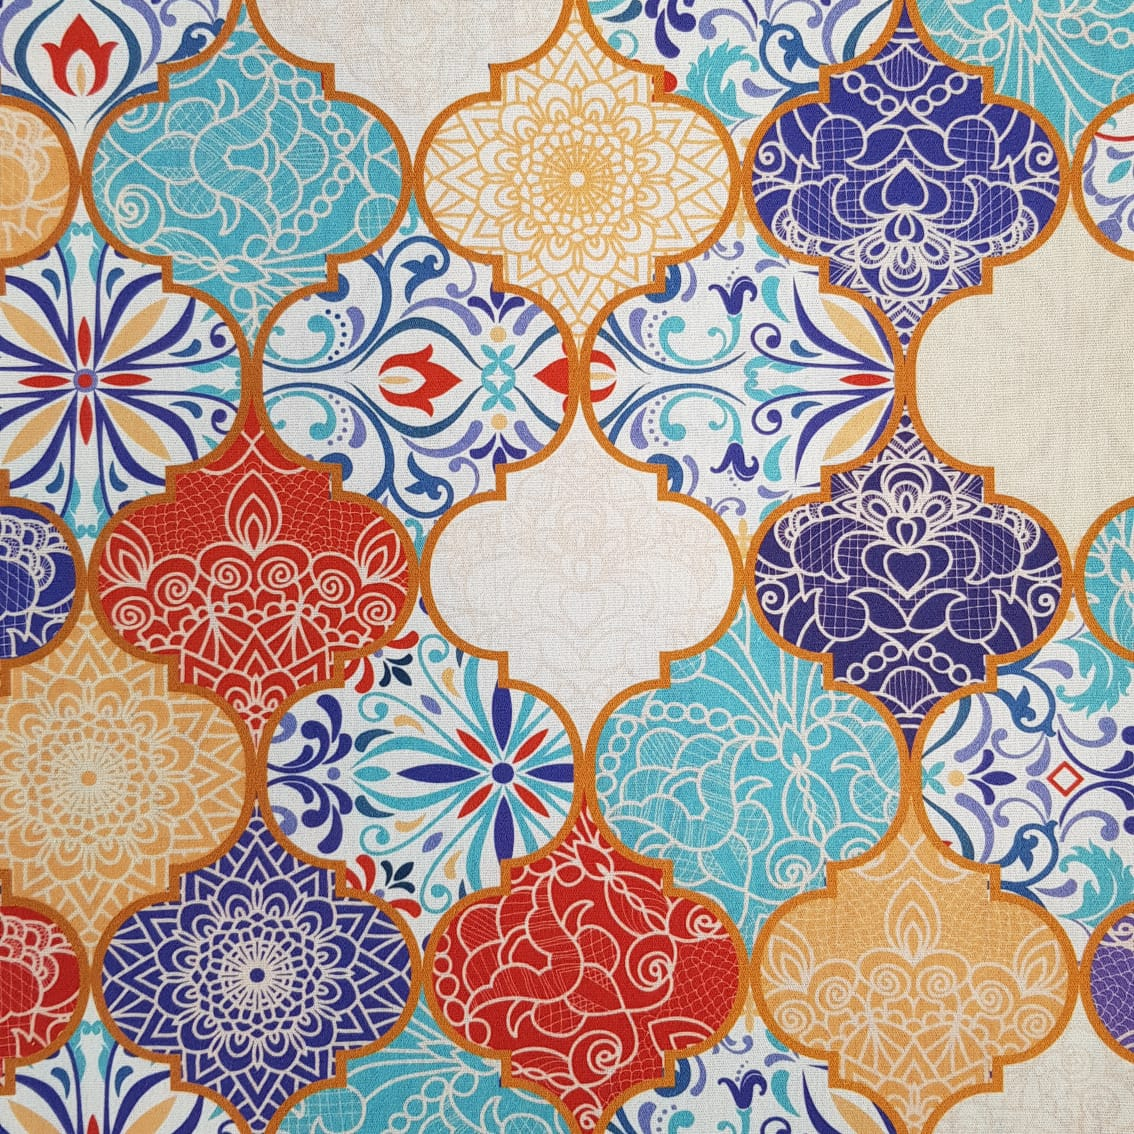 Digital marrocos - 0,25cm x 1,50m